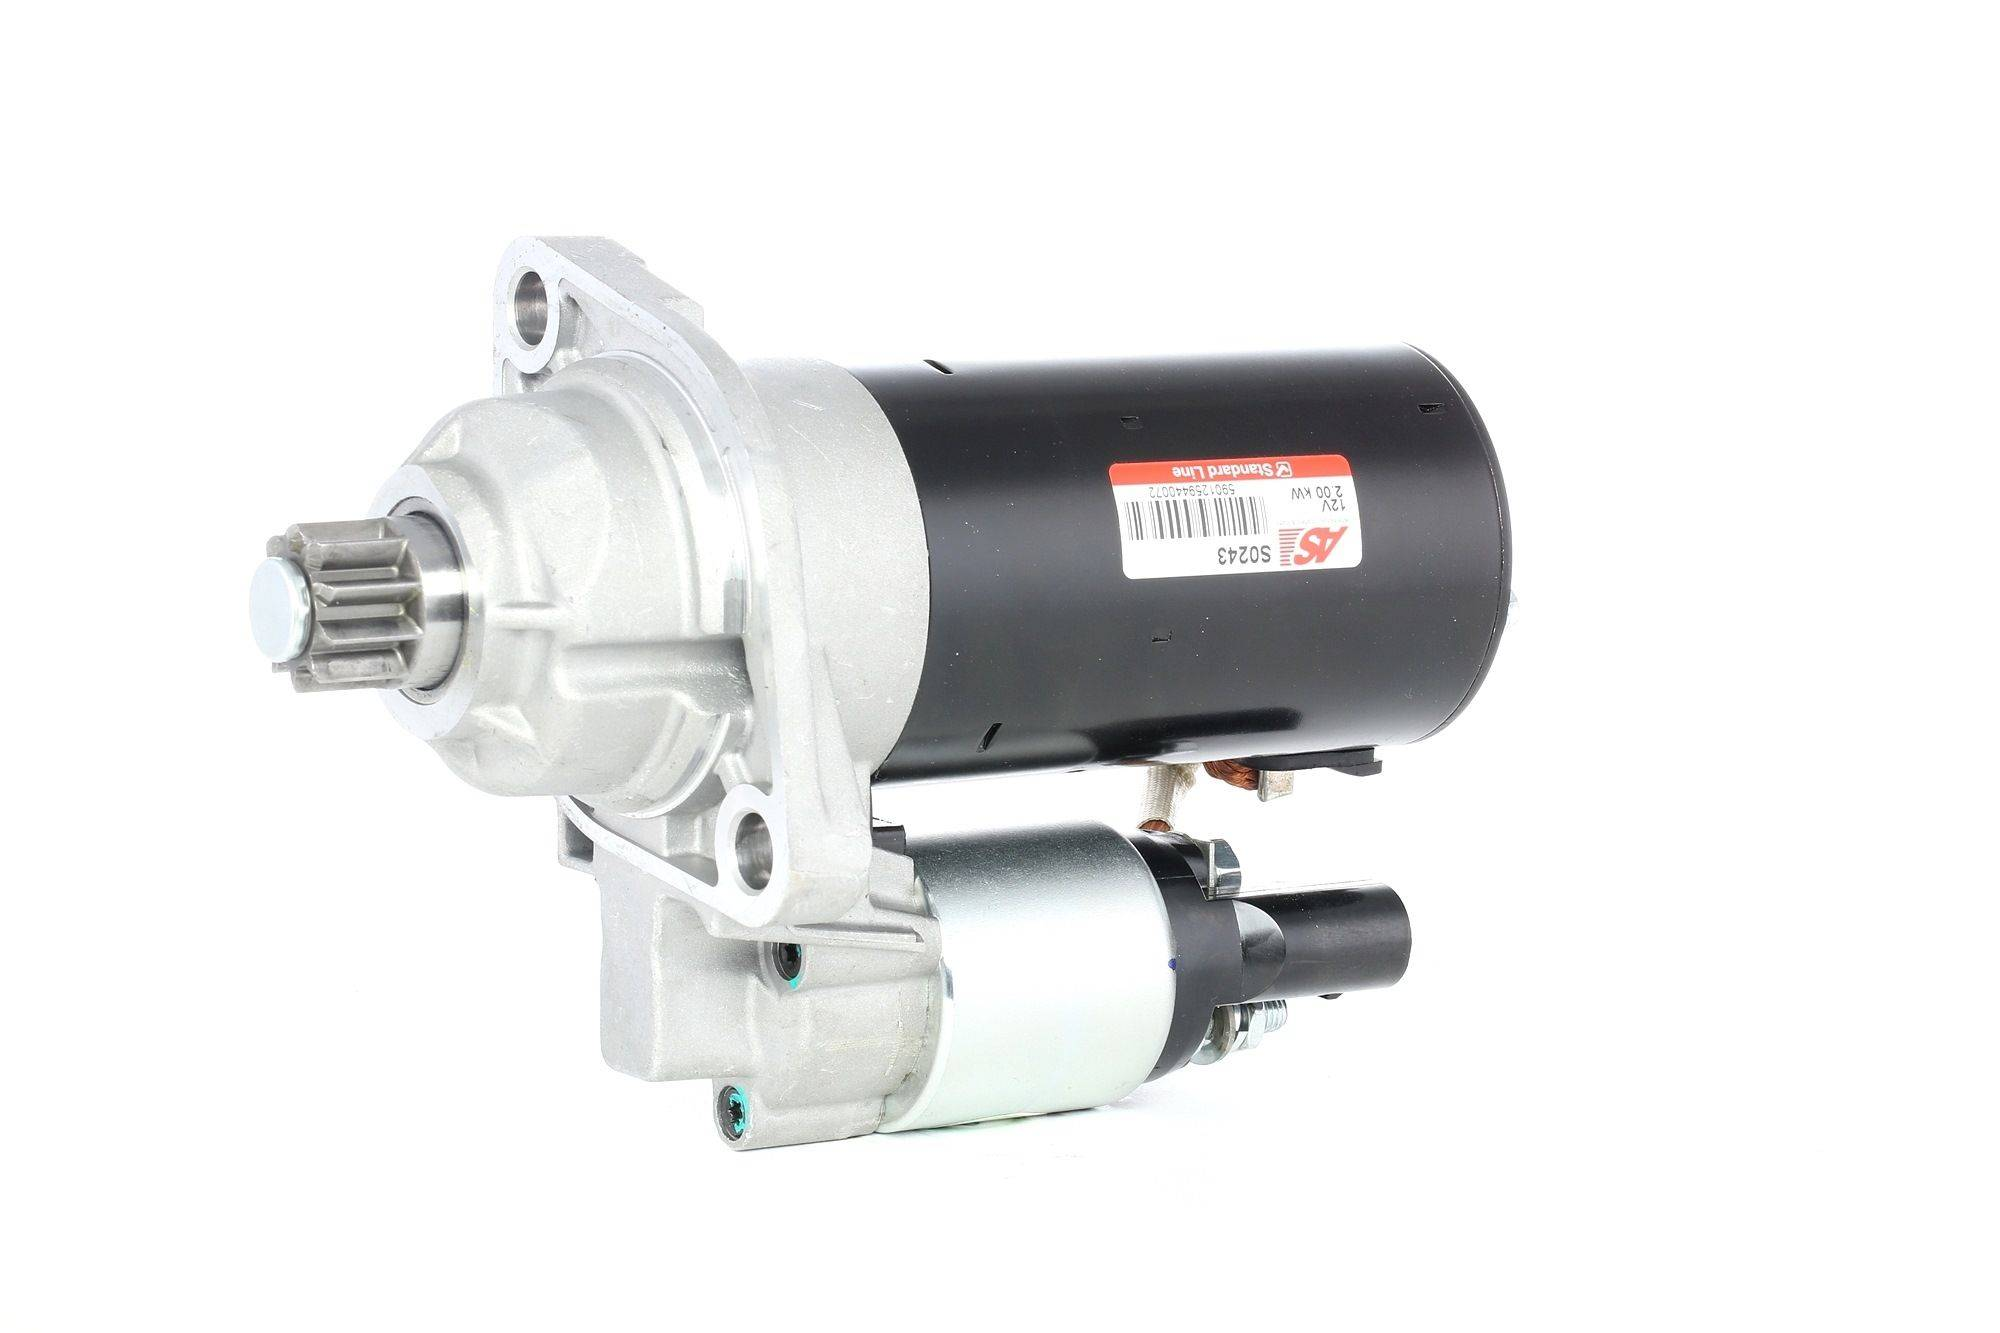 AS-PL Starttimoottori Brand new AS-PL Alternator freewheel pulley S0243 Startti,Käynnistinmoottori VW,SEAT,SKODA,GOLF V 1K1,POLO 9N_,TOURAN 1T1, 1T2